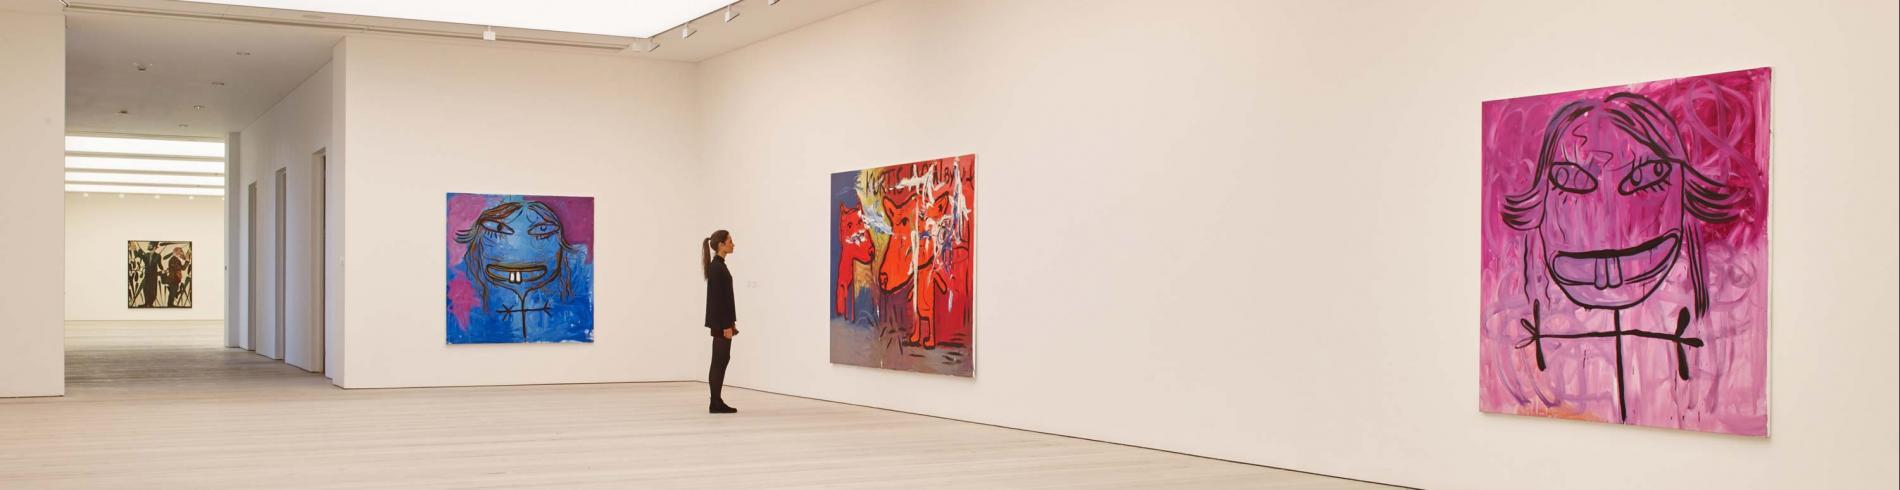 Exhibits at the Saatchi Gallery